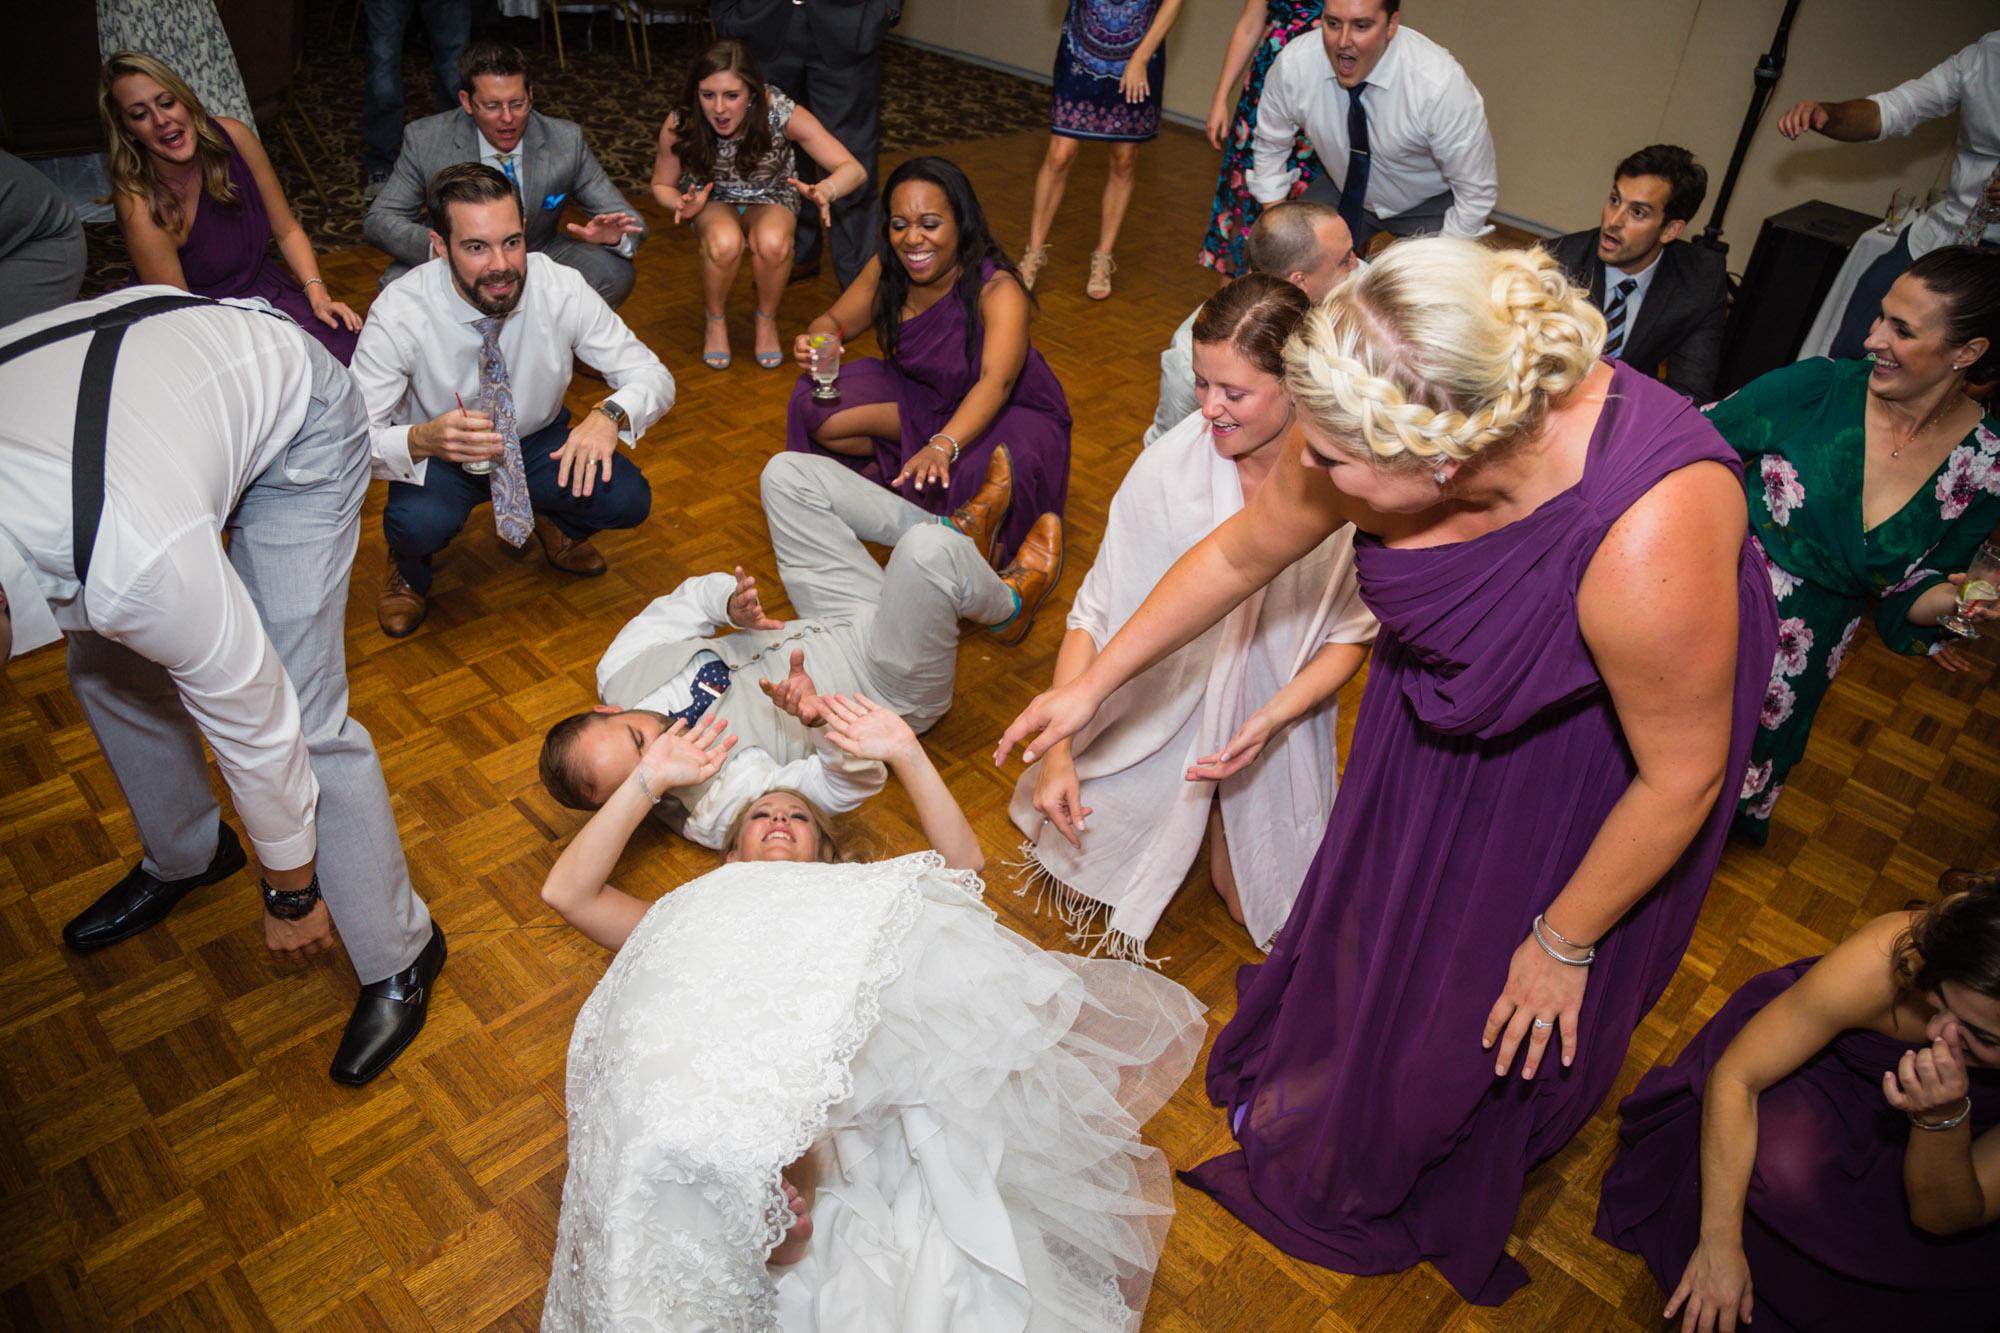 scranton_wedding_photographer_lettieri_pa (43 of 47).jpg